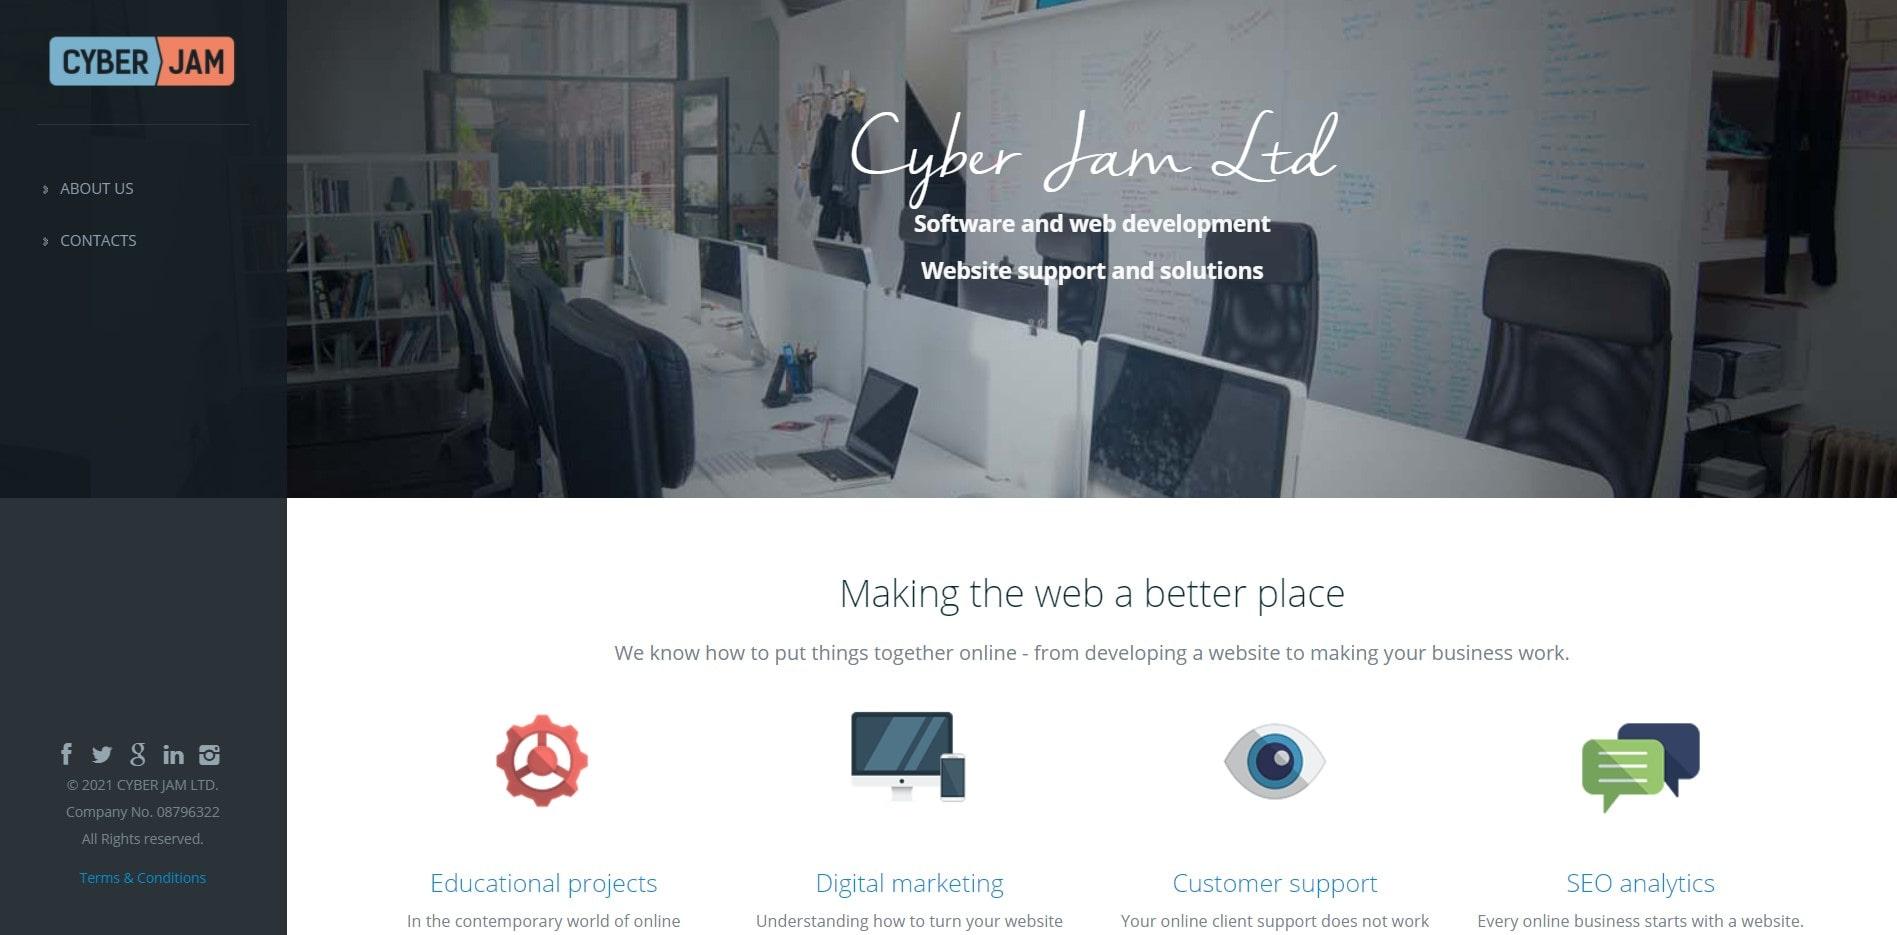 Cyber Jam Ltd